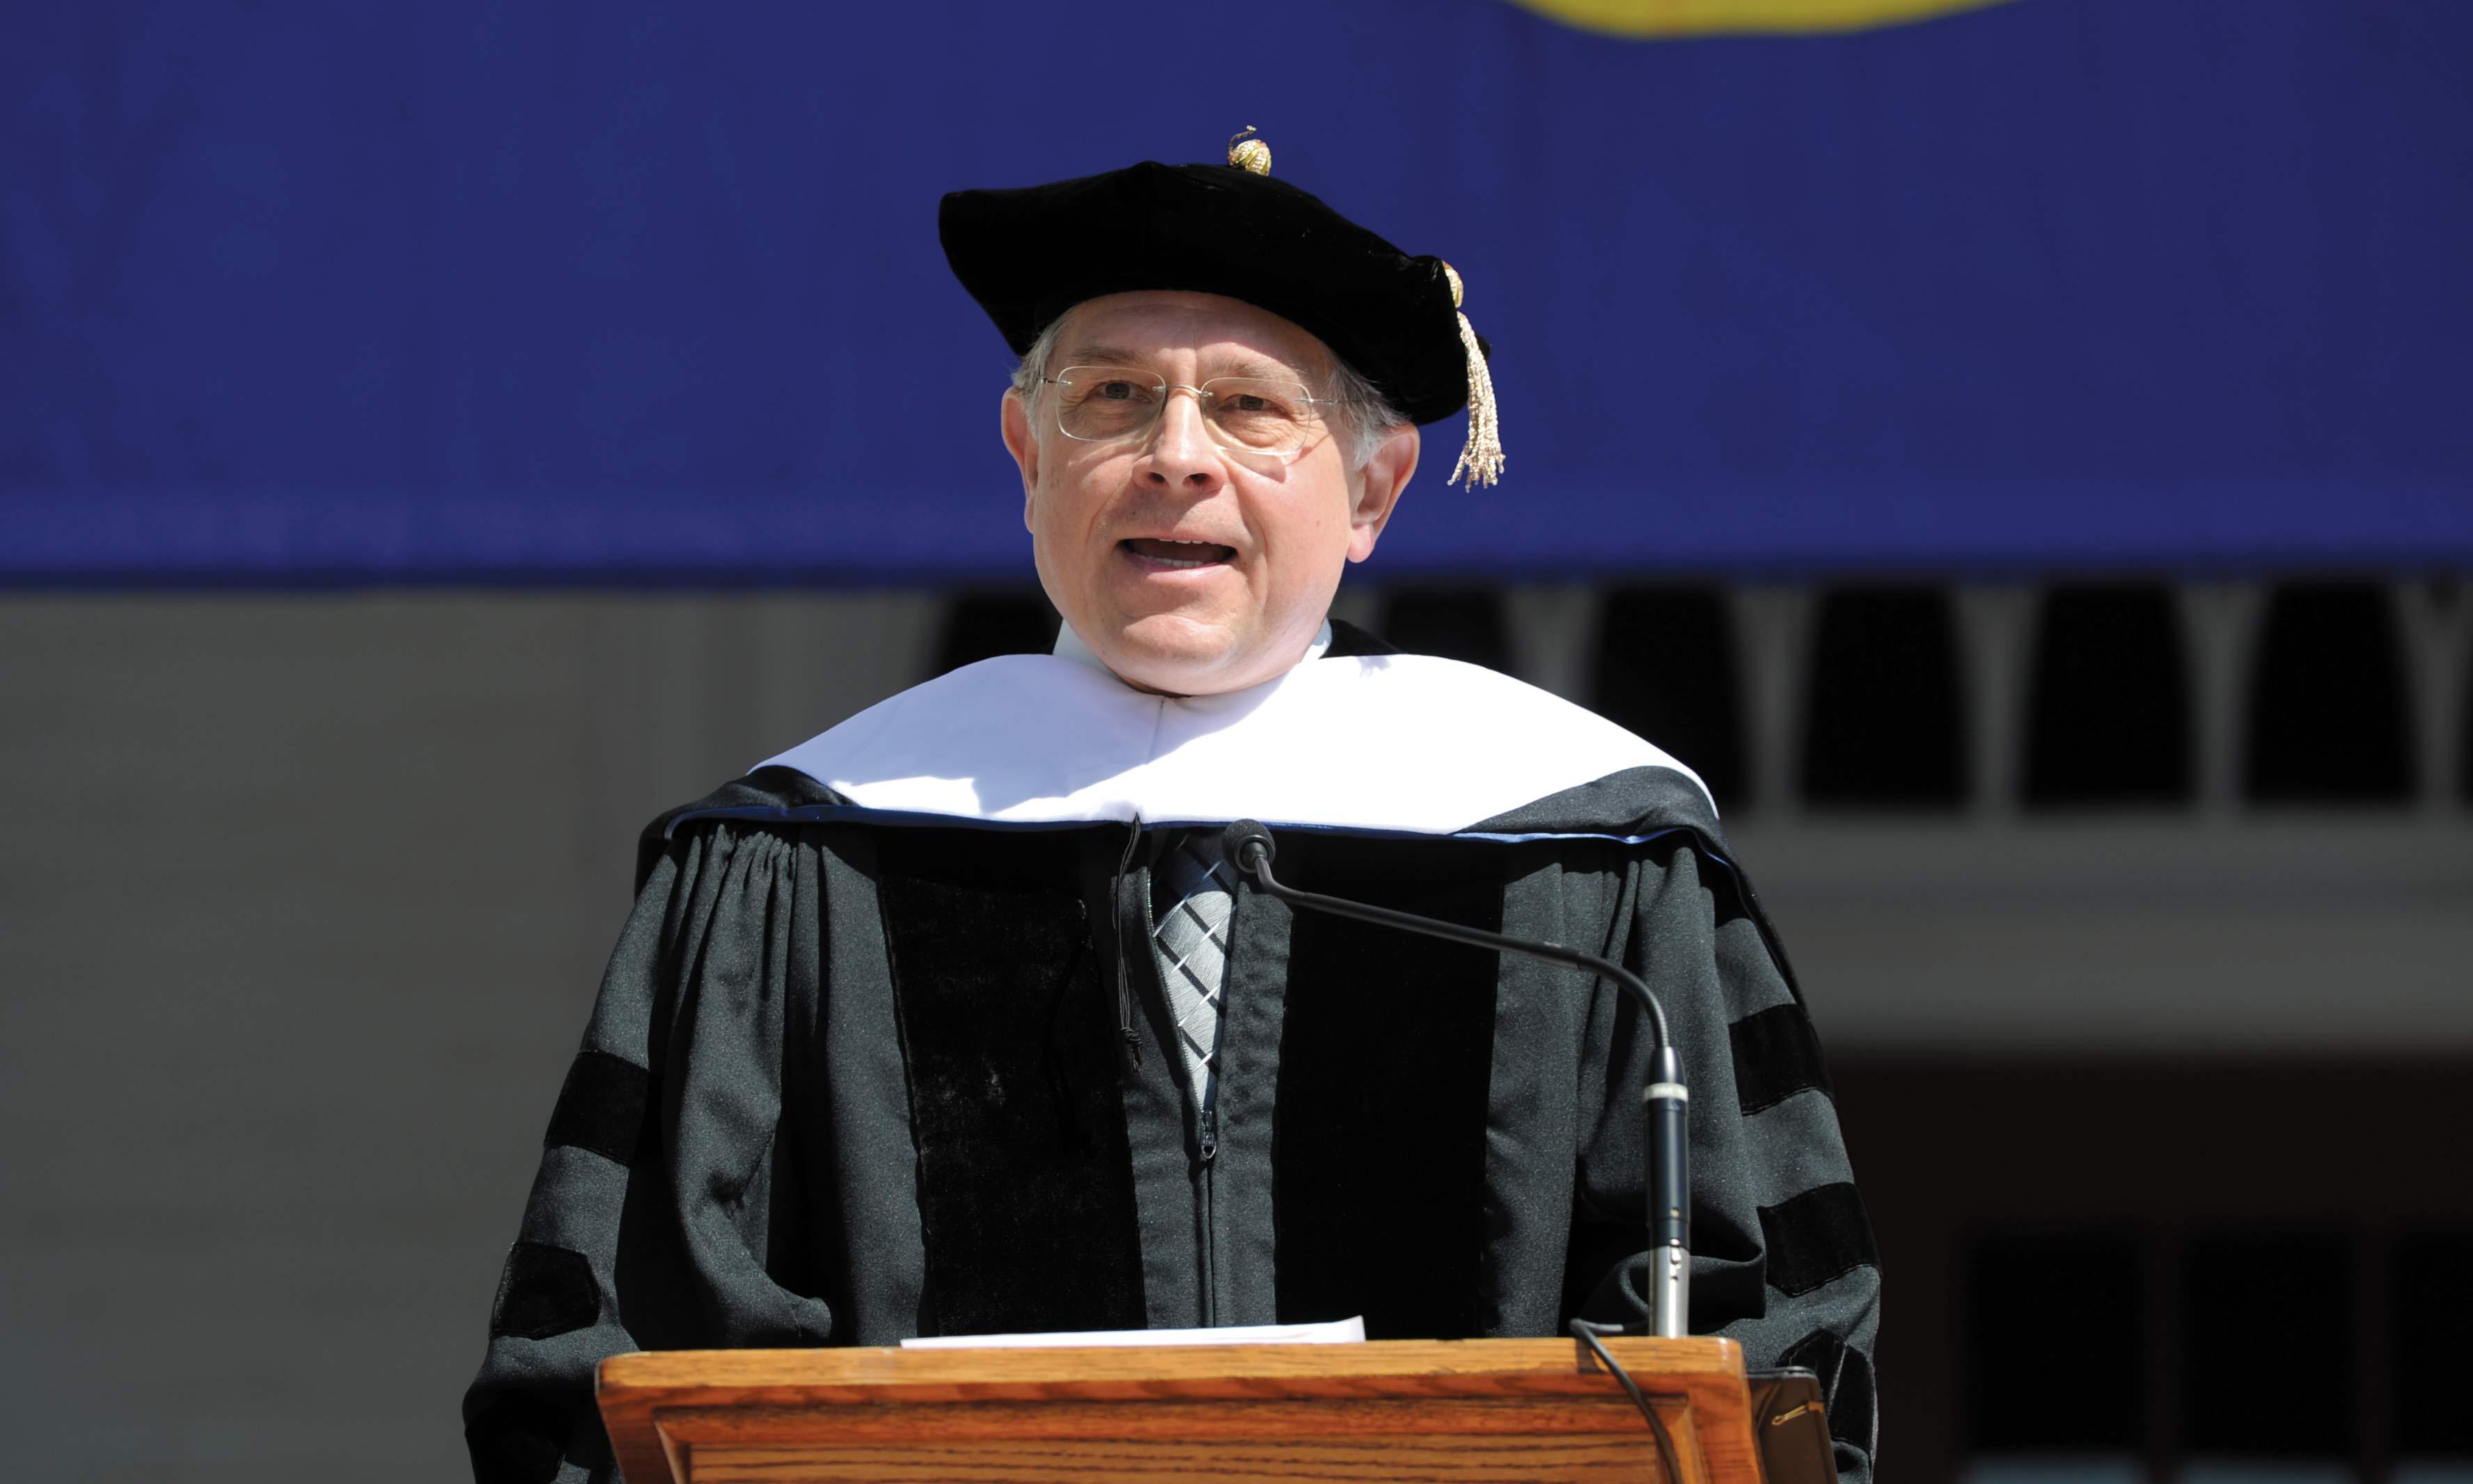 Dr. James Madara '71